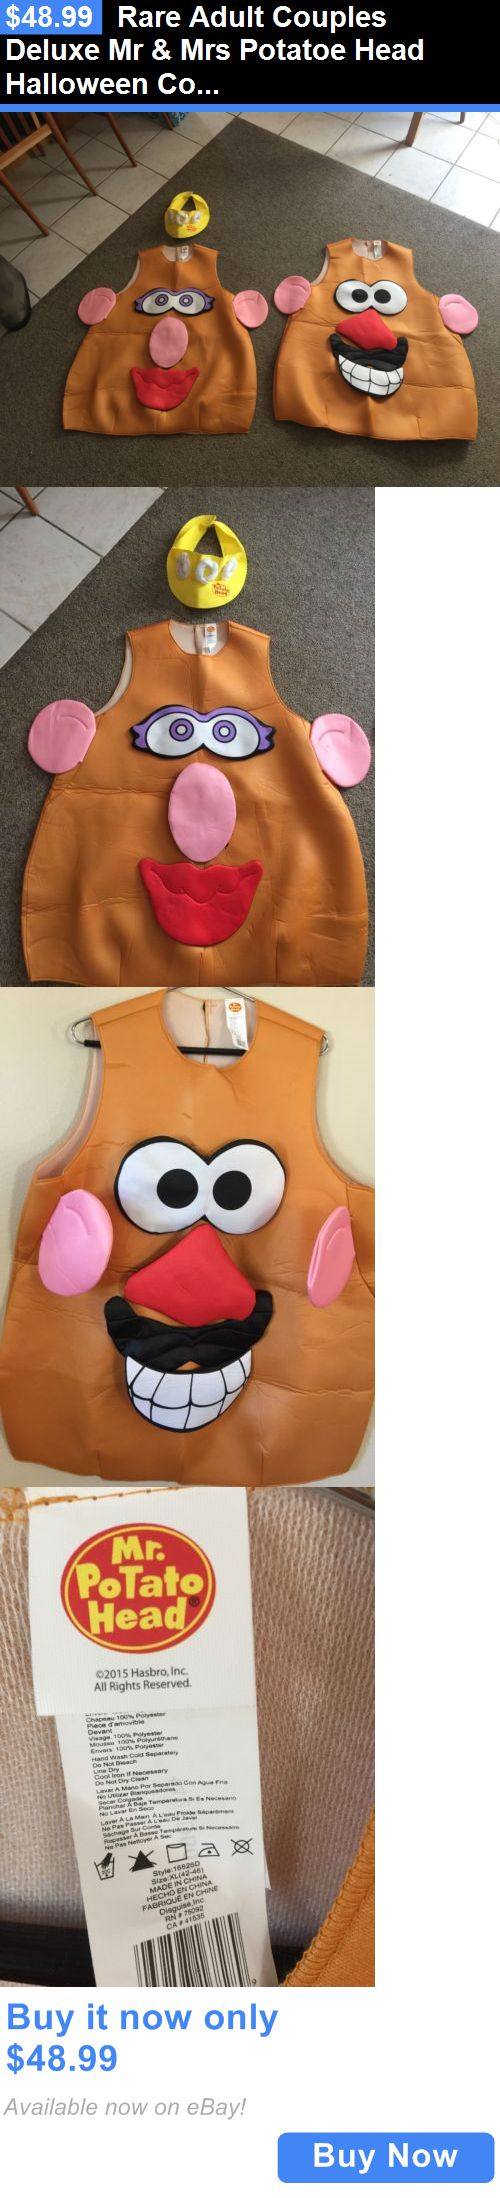 Halloween Costumes Couples: Rare Adult Couples Deluxe Mr And Mrs Potatoe Head Halloween Costumes Xl 42-46 BUY IT NOW ONLY: $48.99 #priceabateHalloweenCostumesCouples OR #priceabate